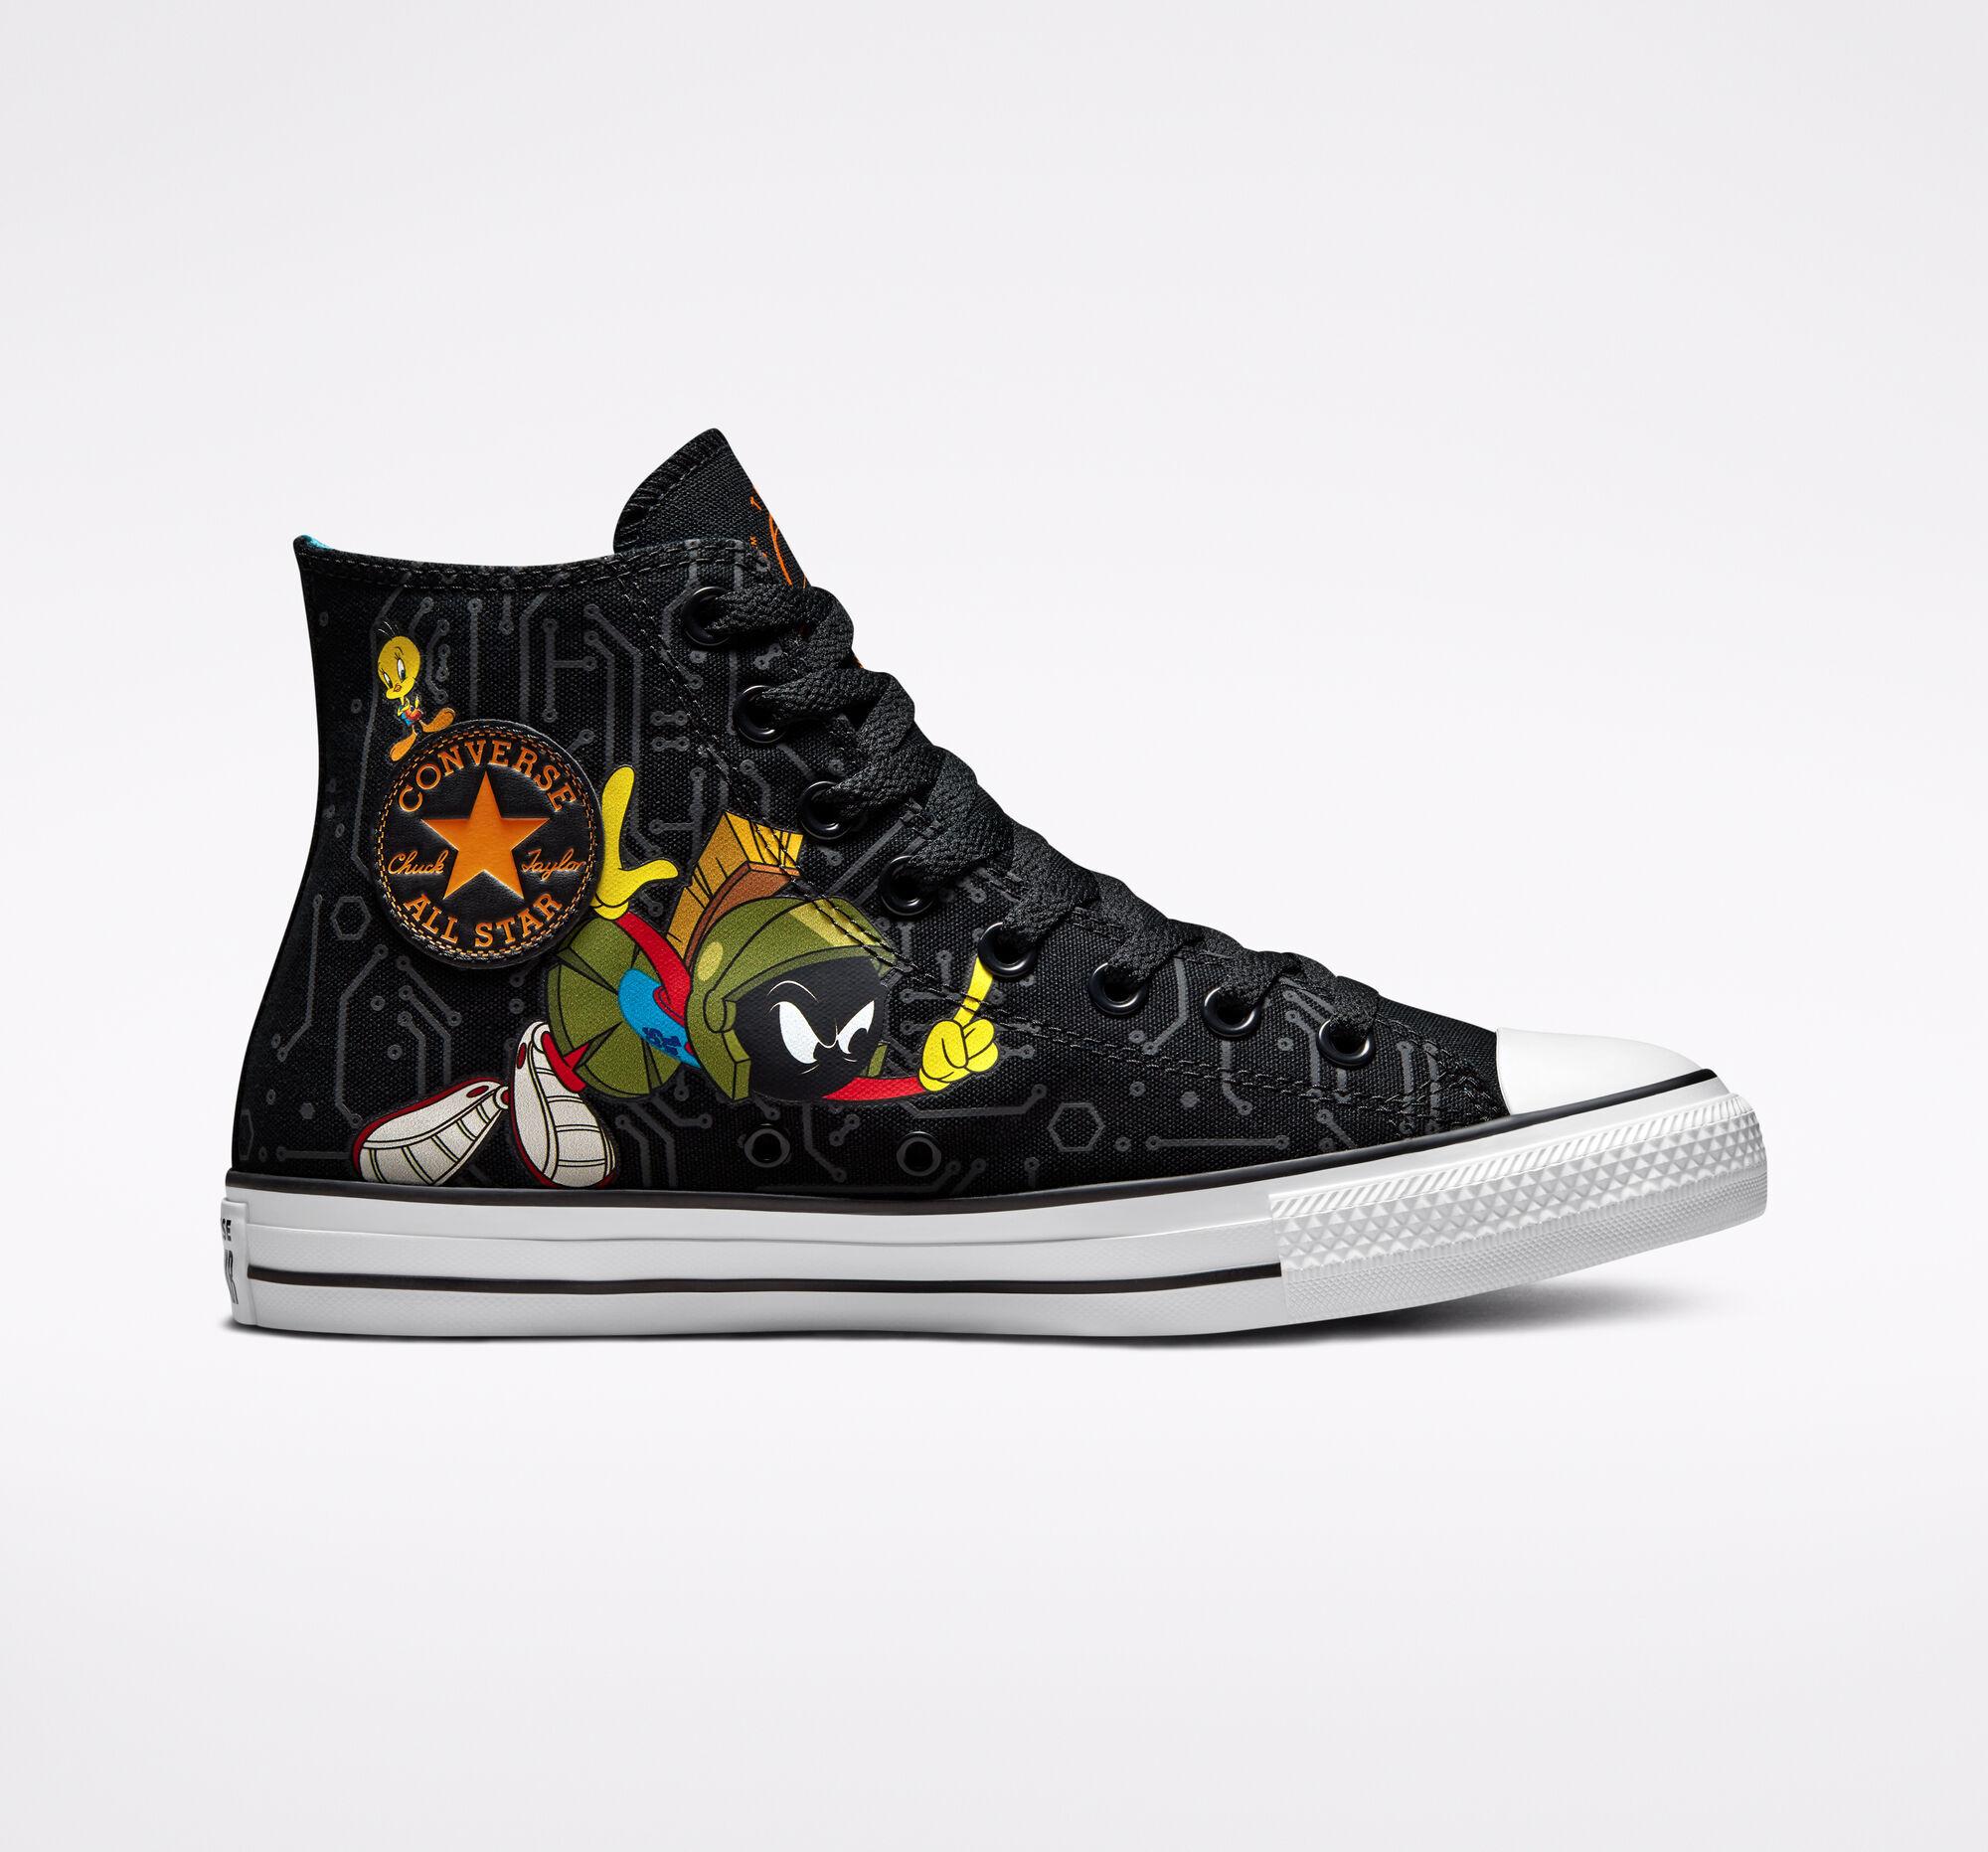 space-jam-x-converse-chuck-taylor-all-star-looney-dream-team-172485c1